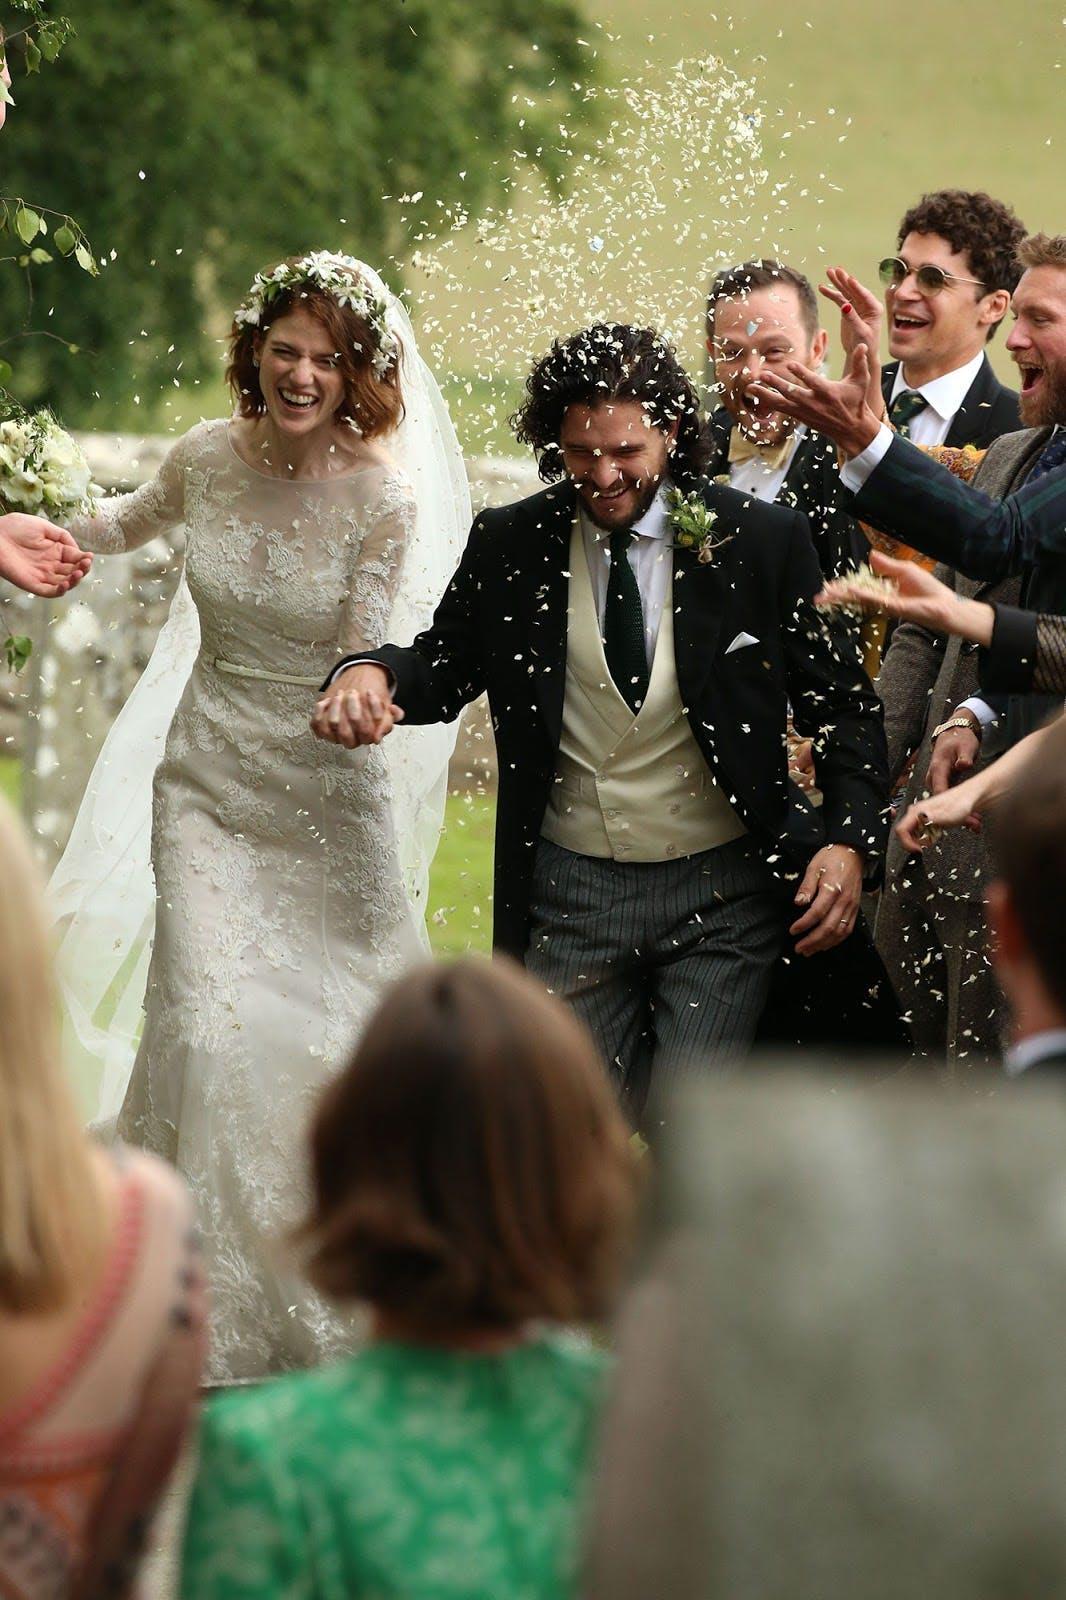 Love Nick Jonas' wedding tuxedo, Ryan Lochte's wedding suit or Pusha T's wedding tuxedo? Create celebrity wedding style for grooms on a budget.